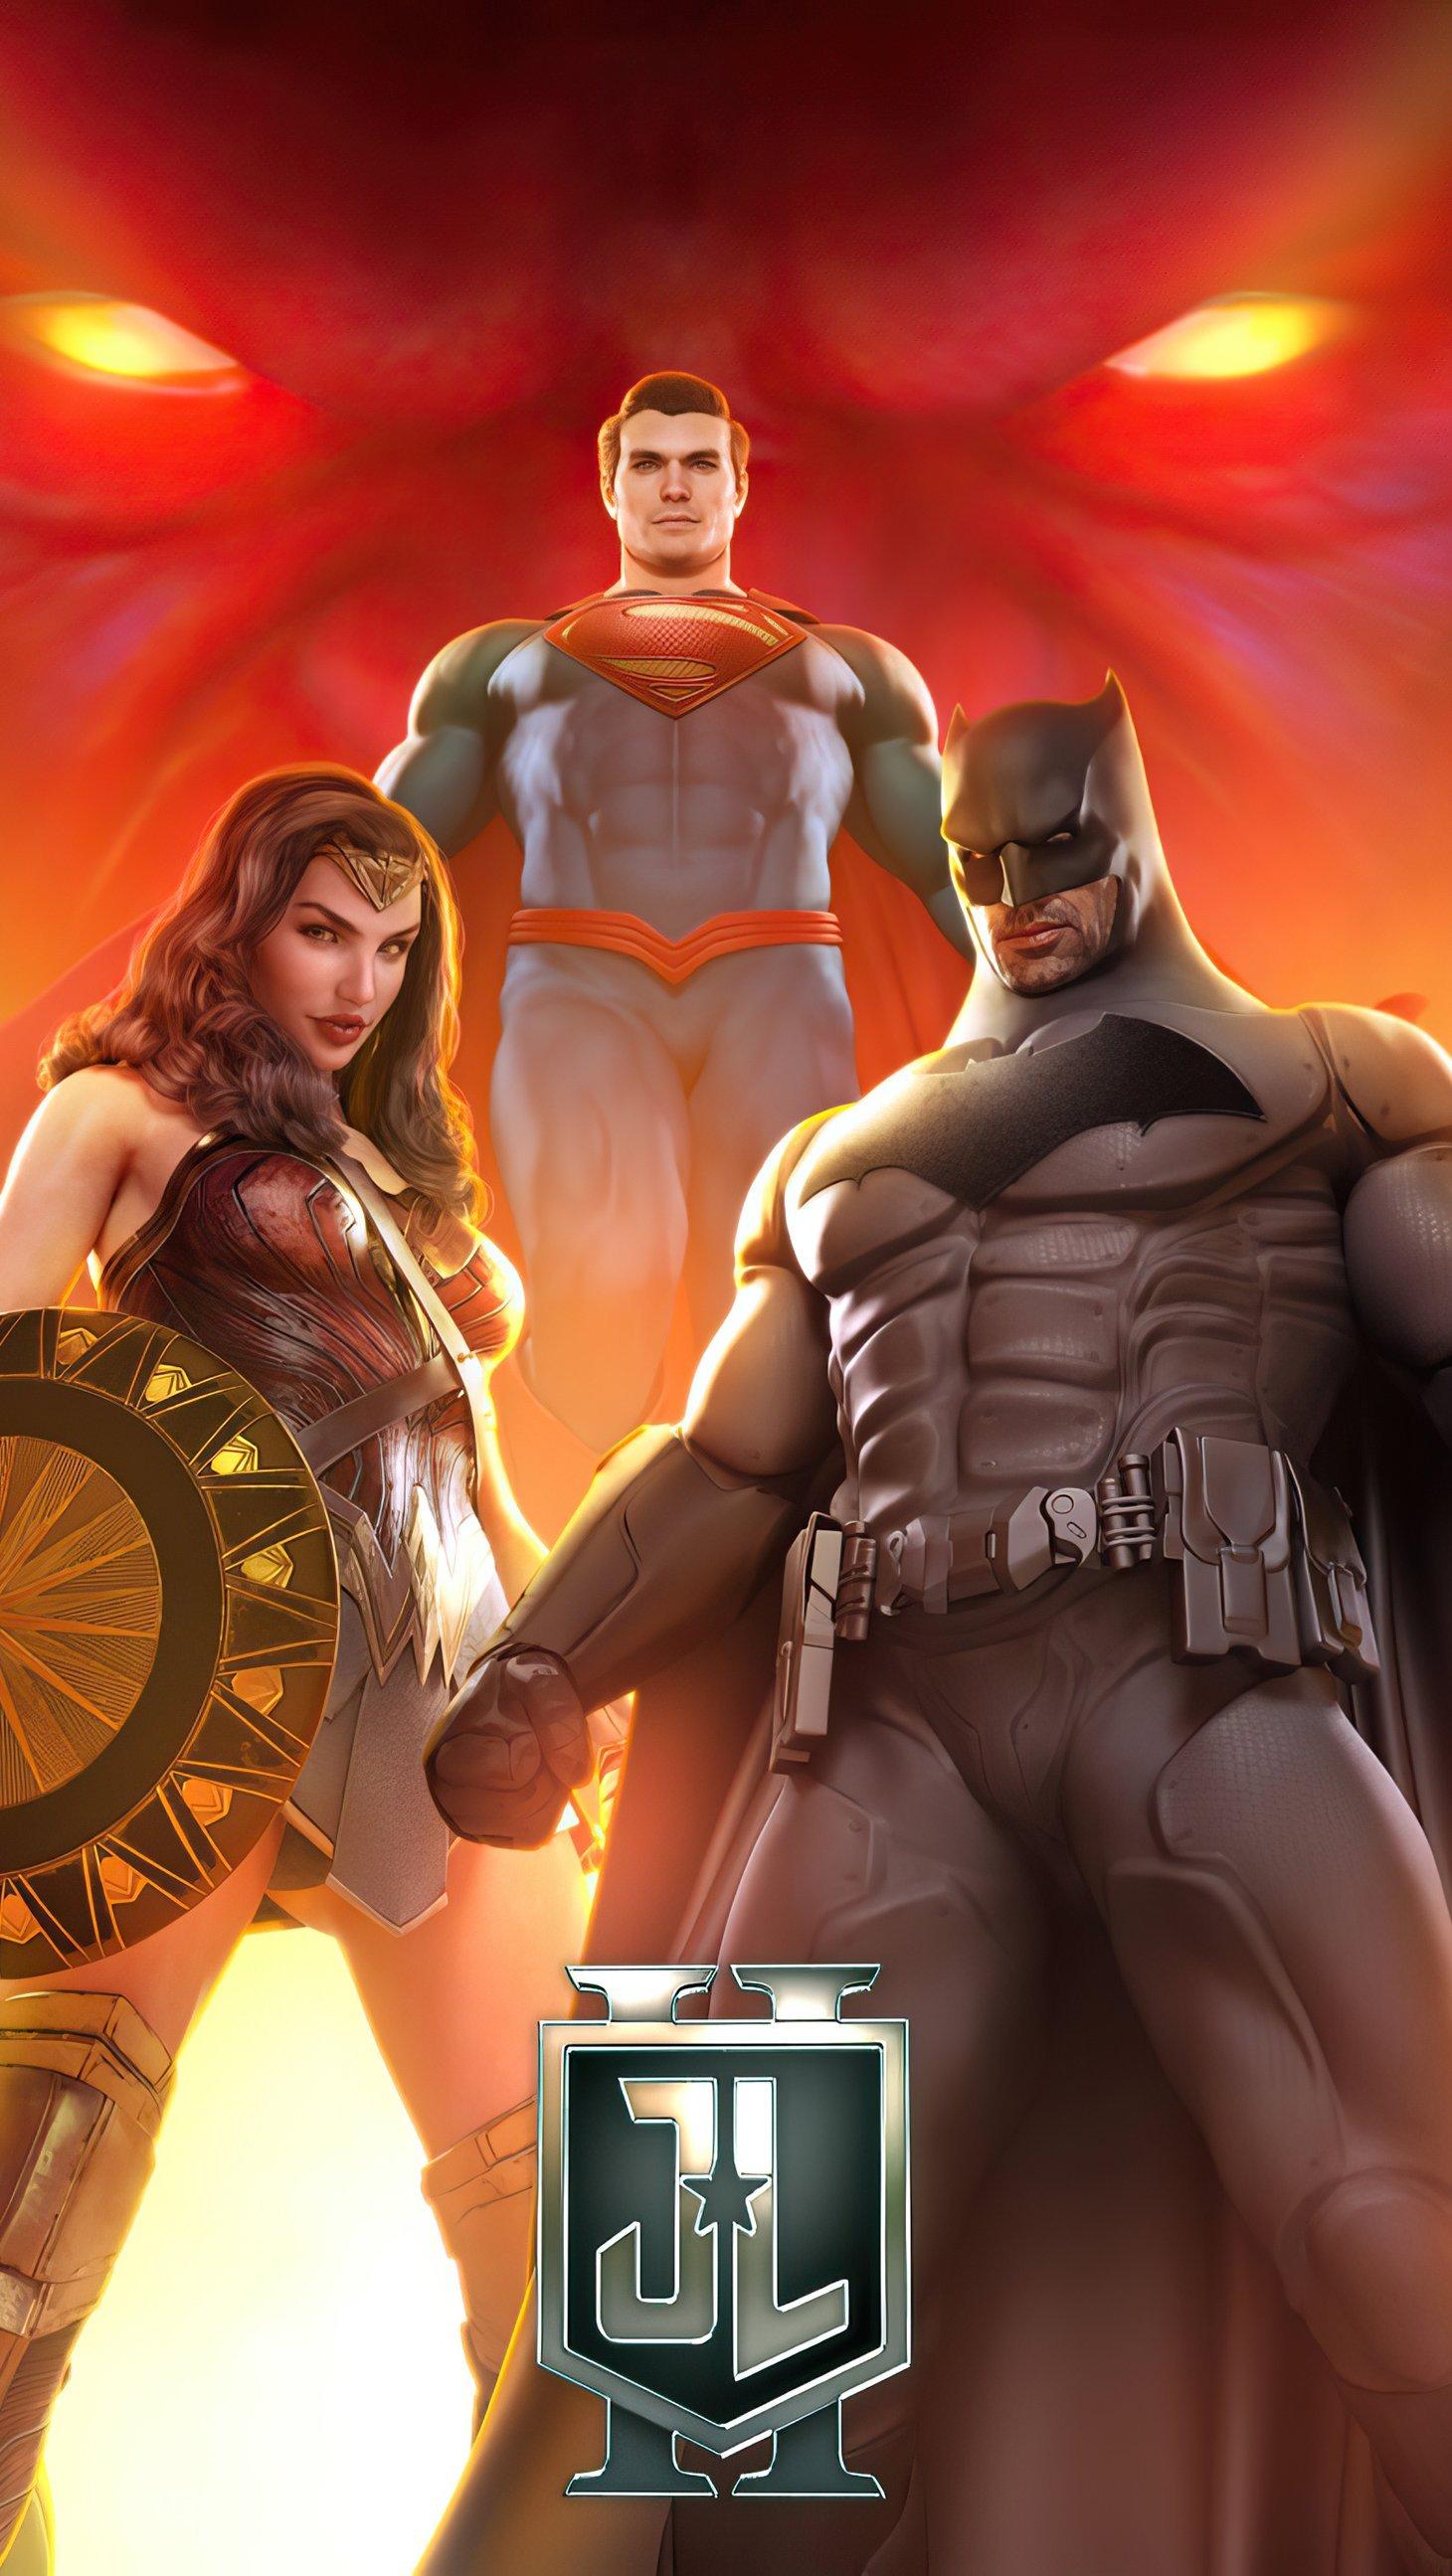 Fondos de pantalla Superheroes de Liga de la Justicia Vertical